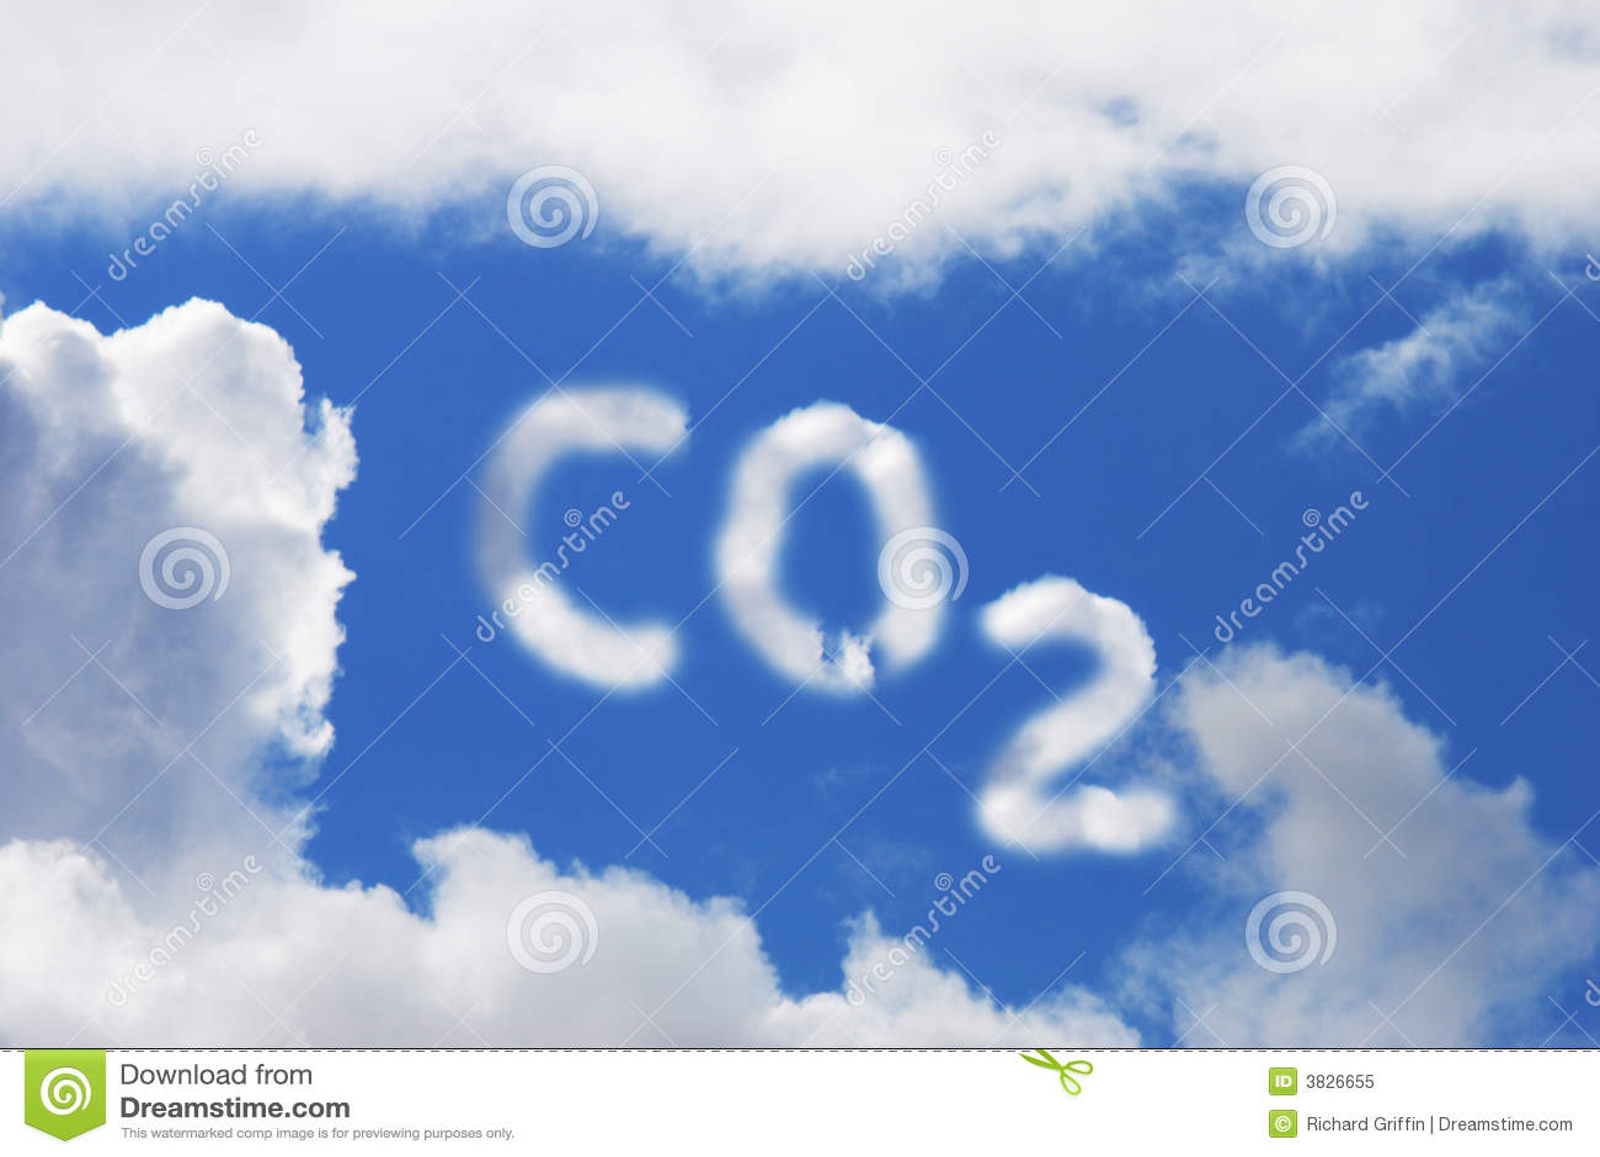 Carbon dioxide symbol stock image image of carbon global 3826655 carbon dioxide symbol buycottarizona Images